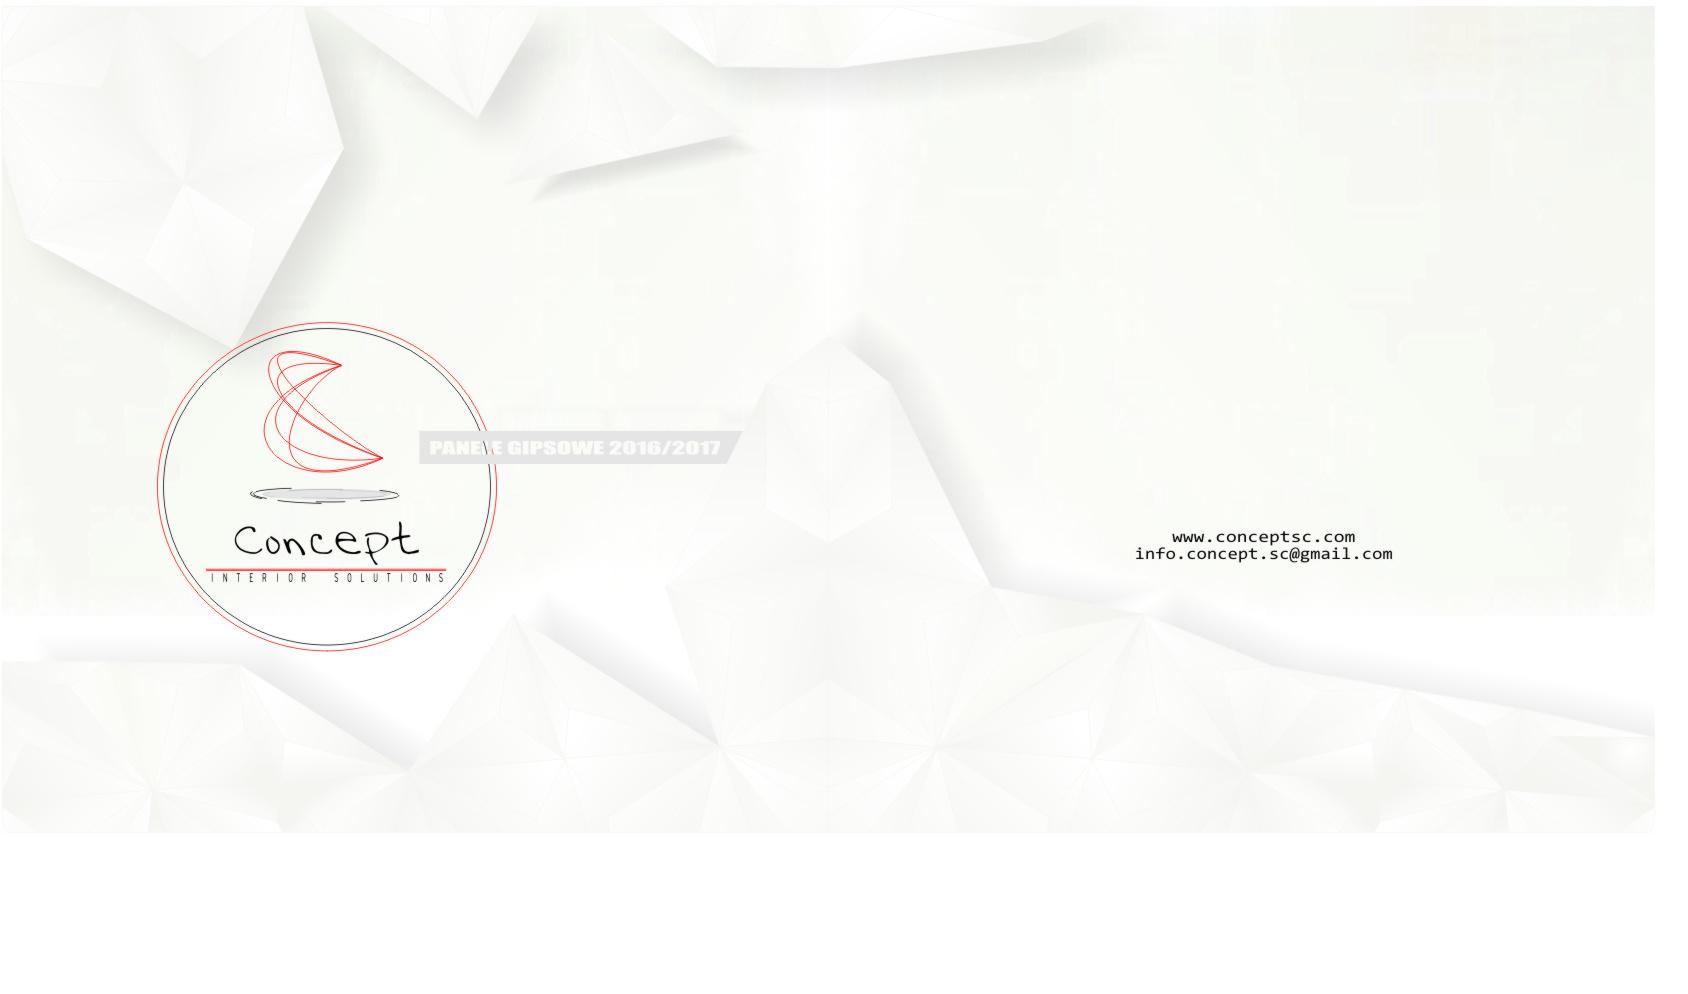 katalog panele gipsowe  Concept str1